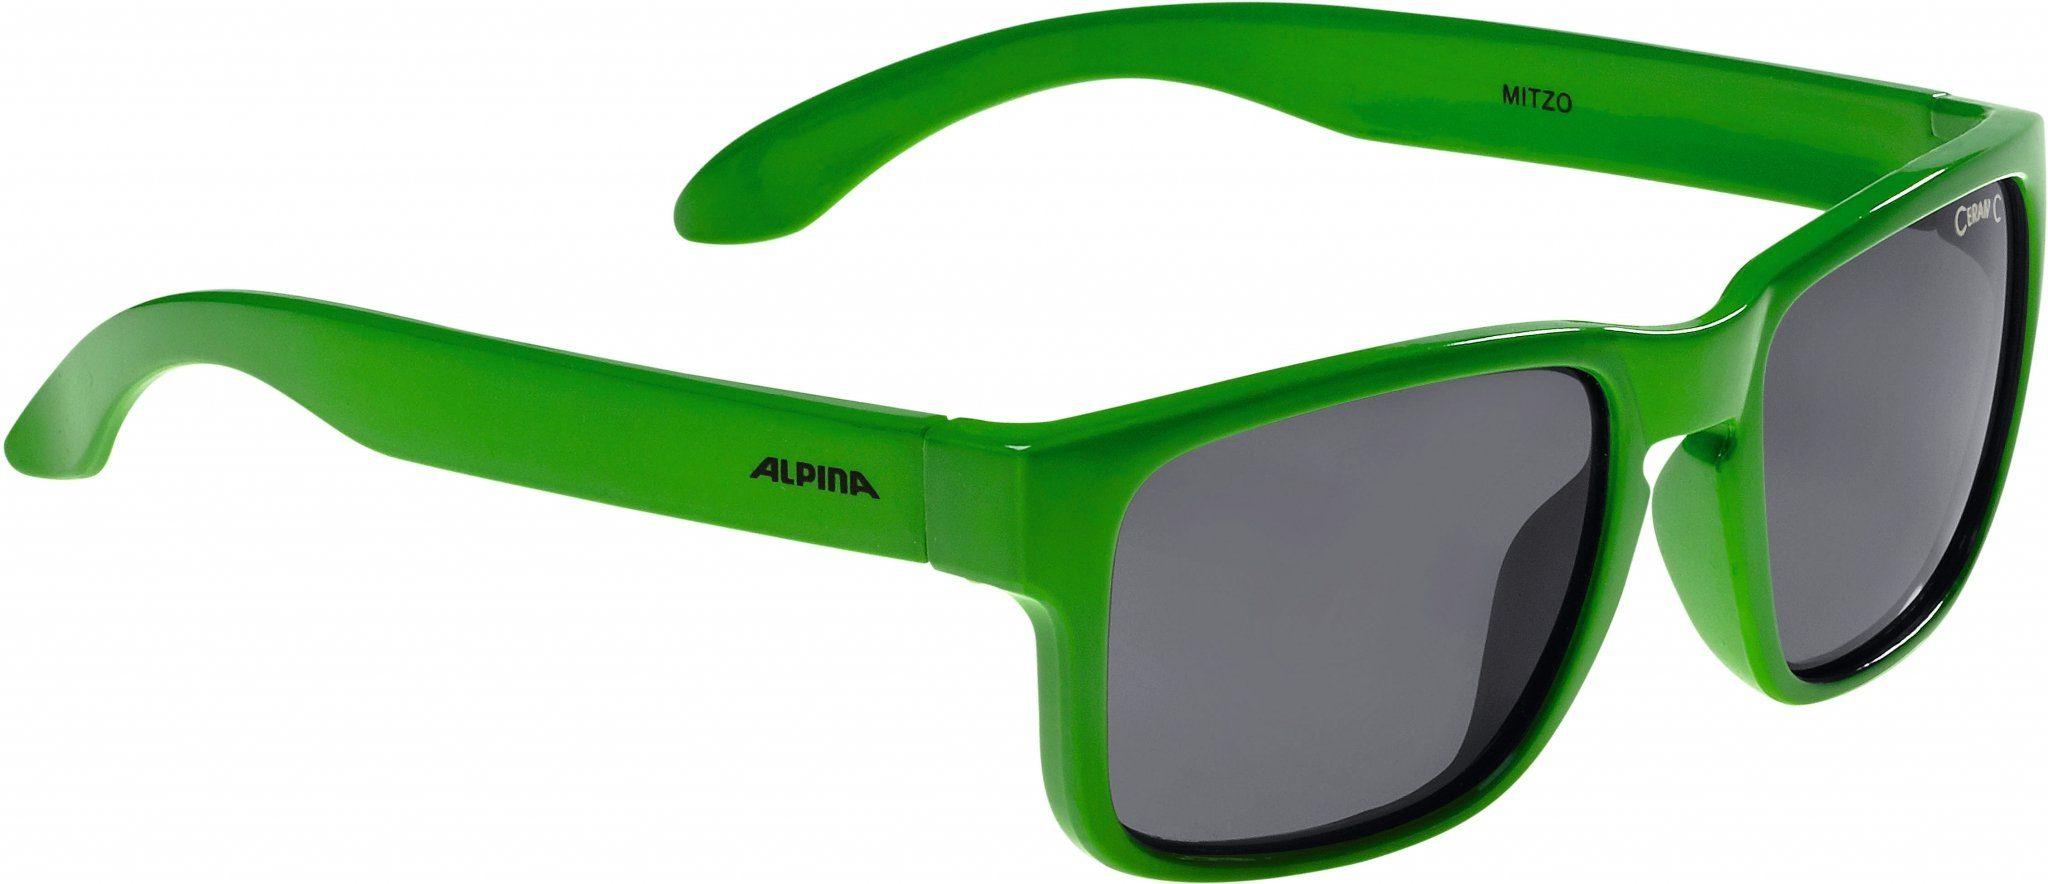 Alpina Sports Radsportbrille »Mitzo Kids«